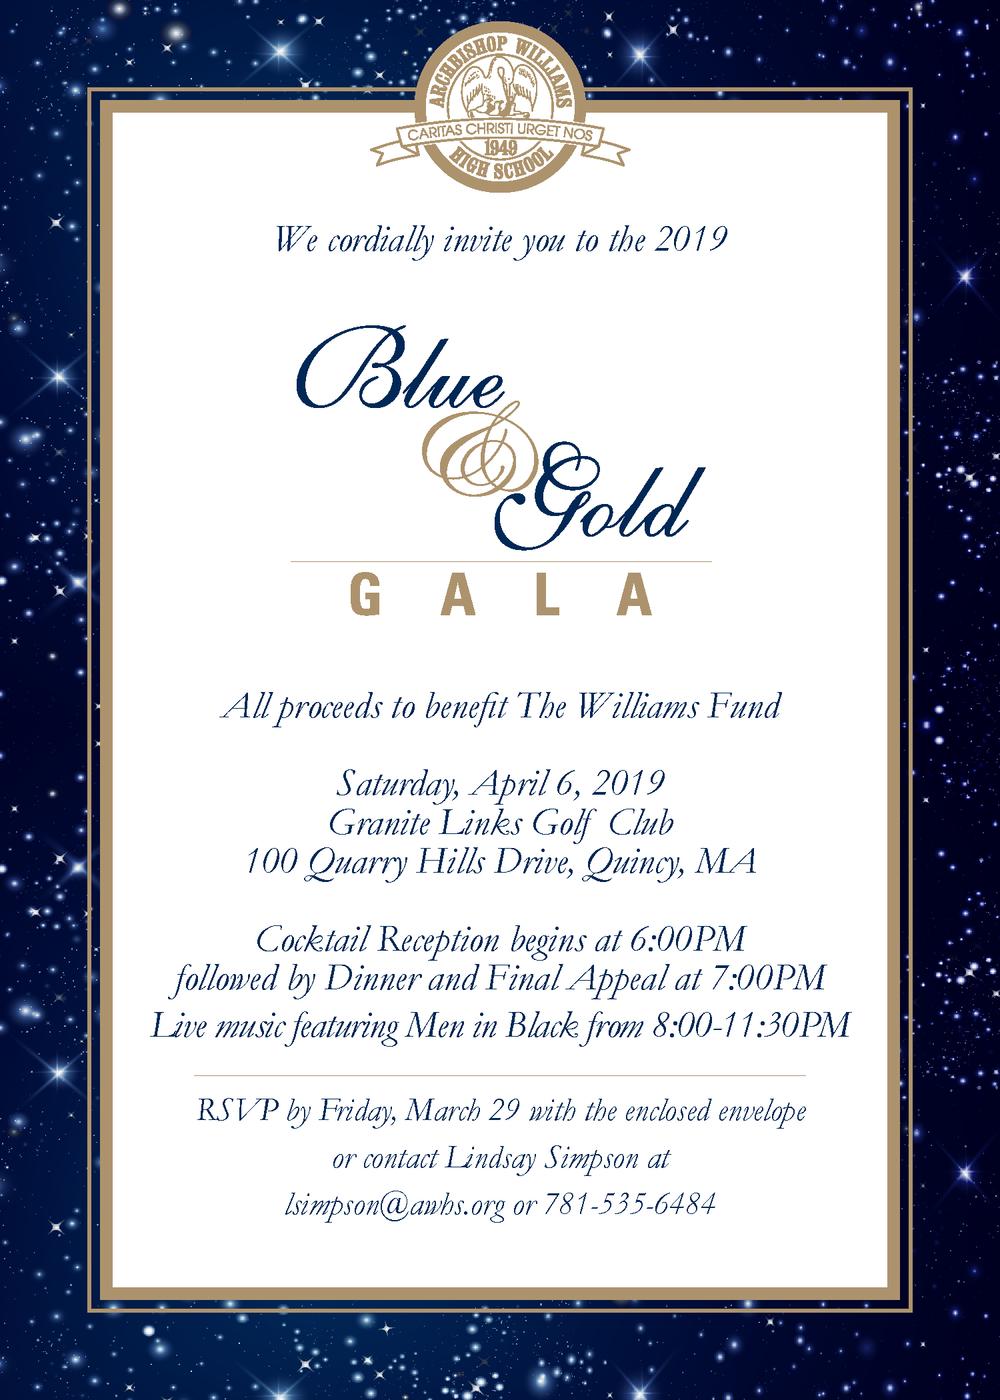 AWHS_BlueAndGoldGala_Invite_5x7_web.png